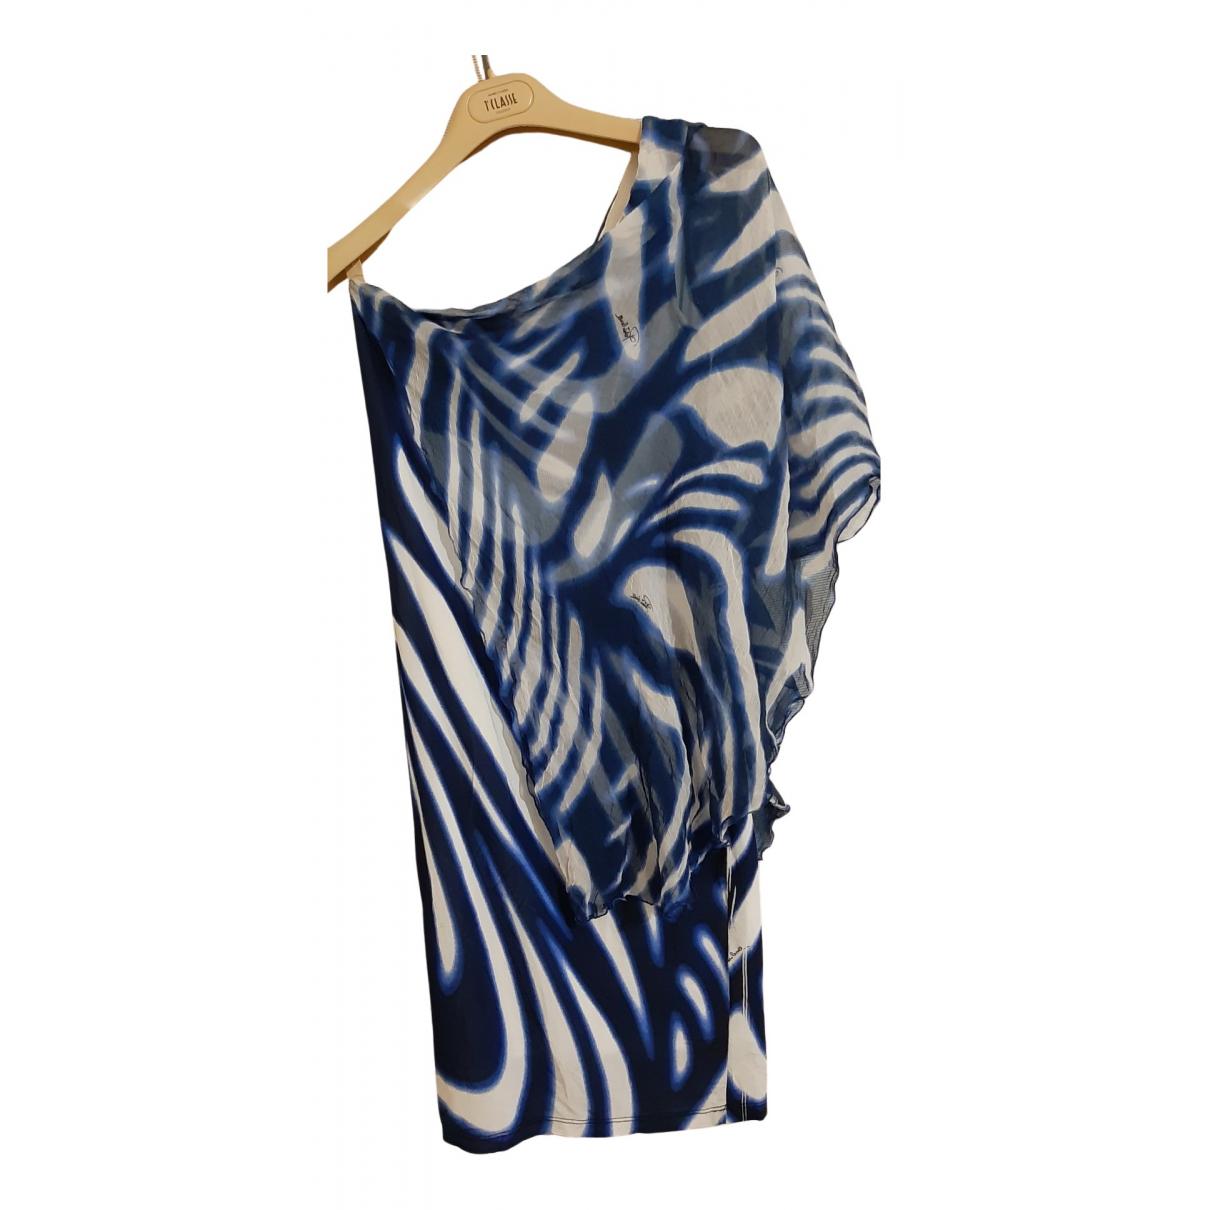 Roberto Cavalli N Multicolour dress for Women M International